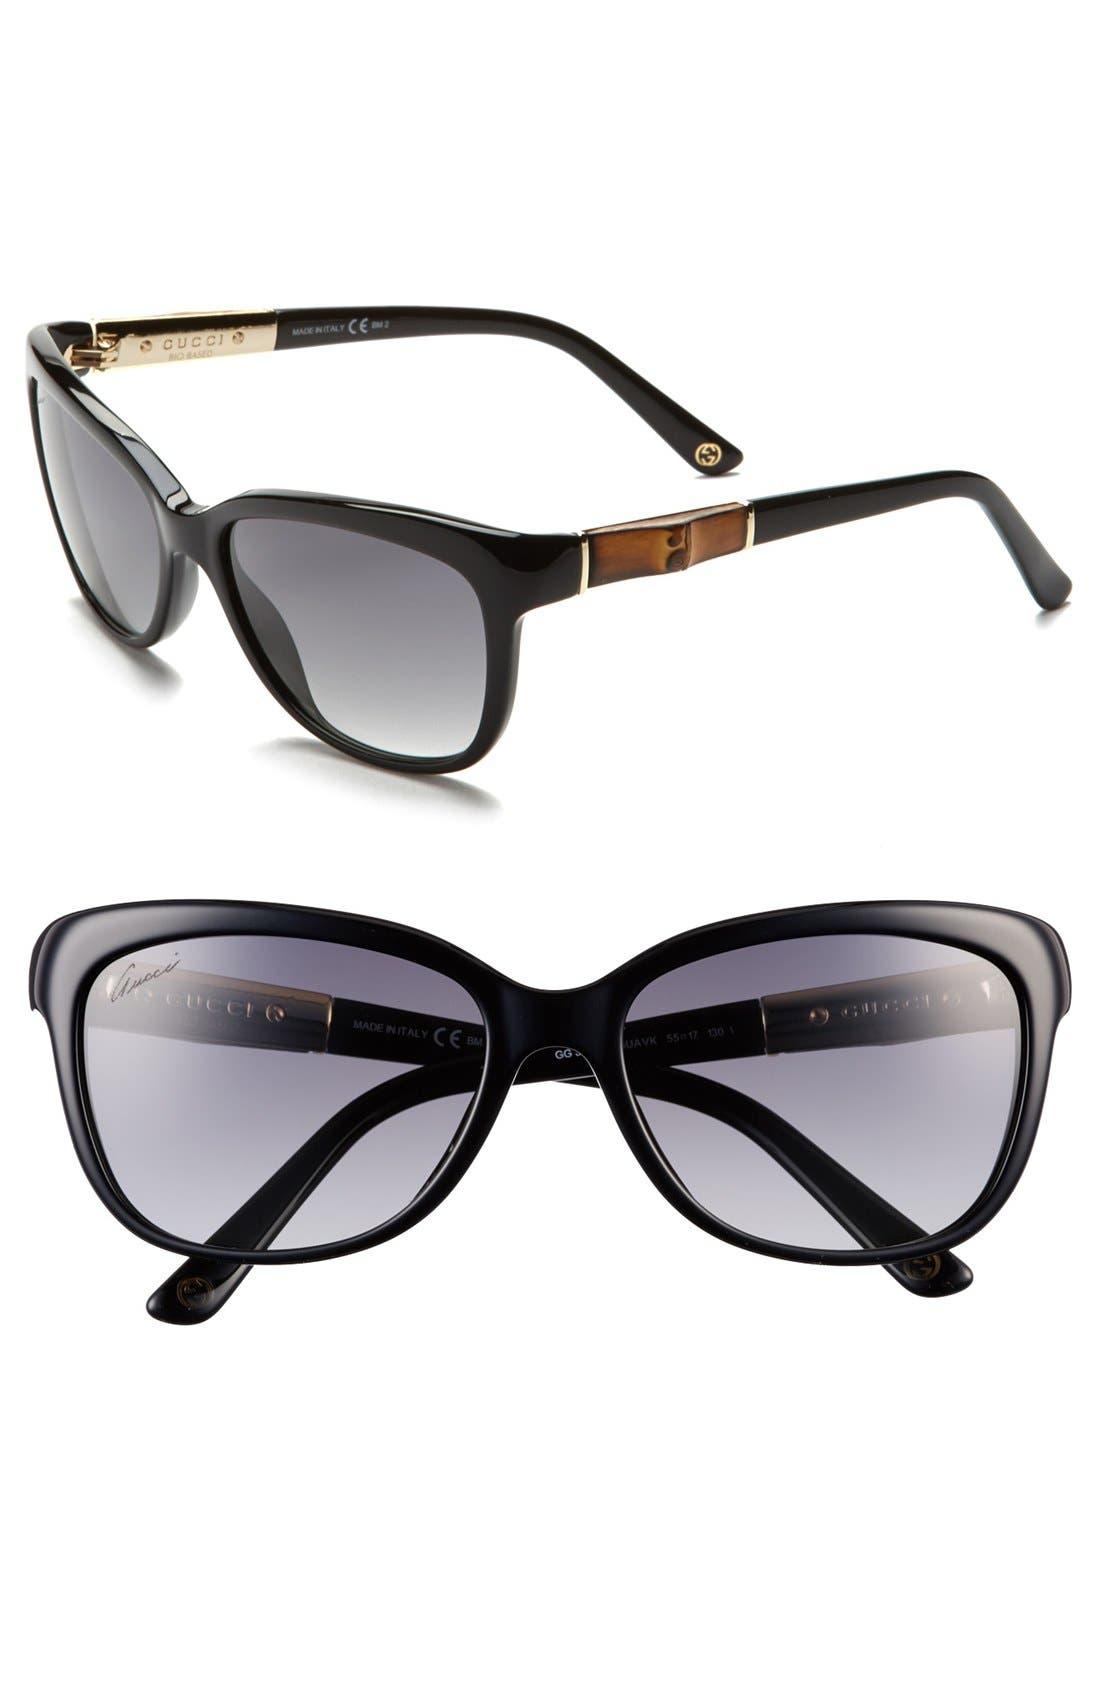 Main Image - Gucci 55mm Bamboo Temple Sunglasses